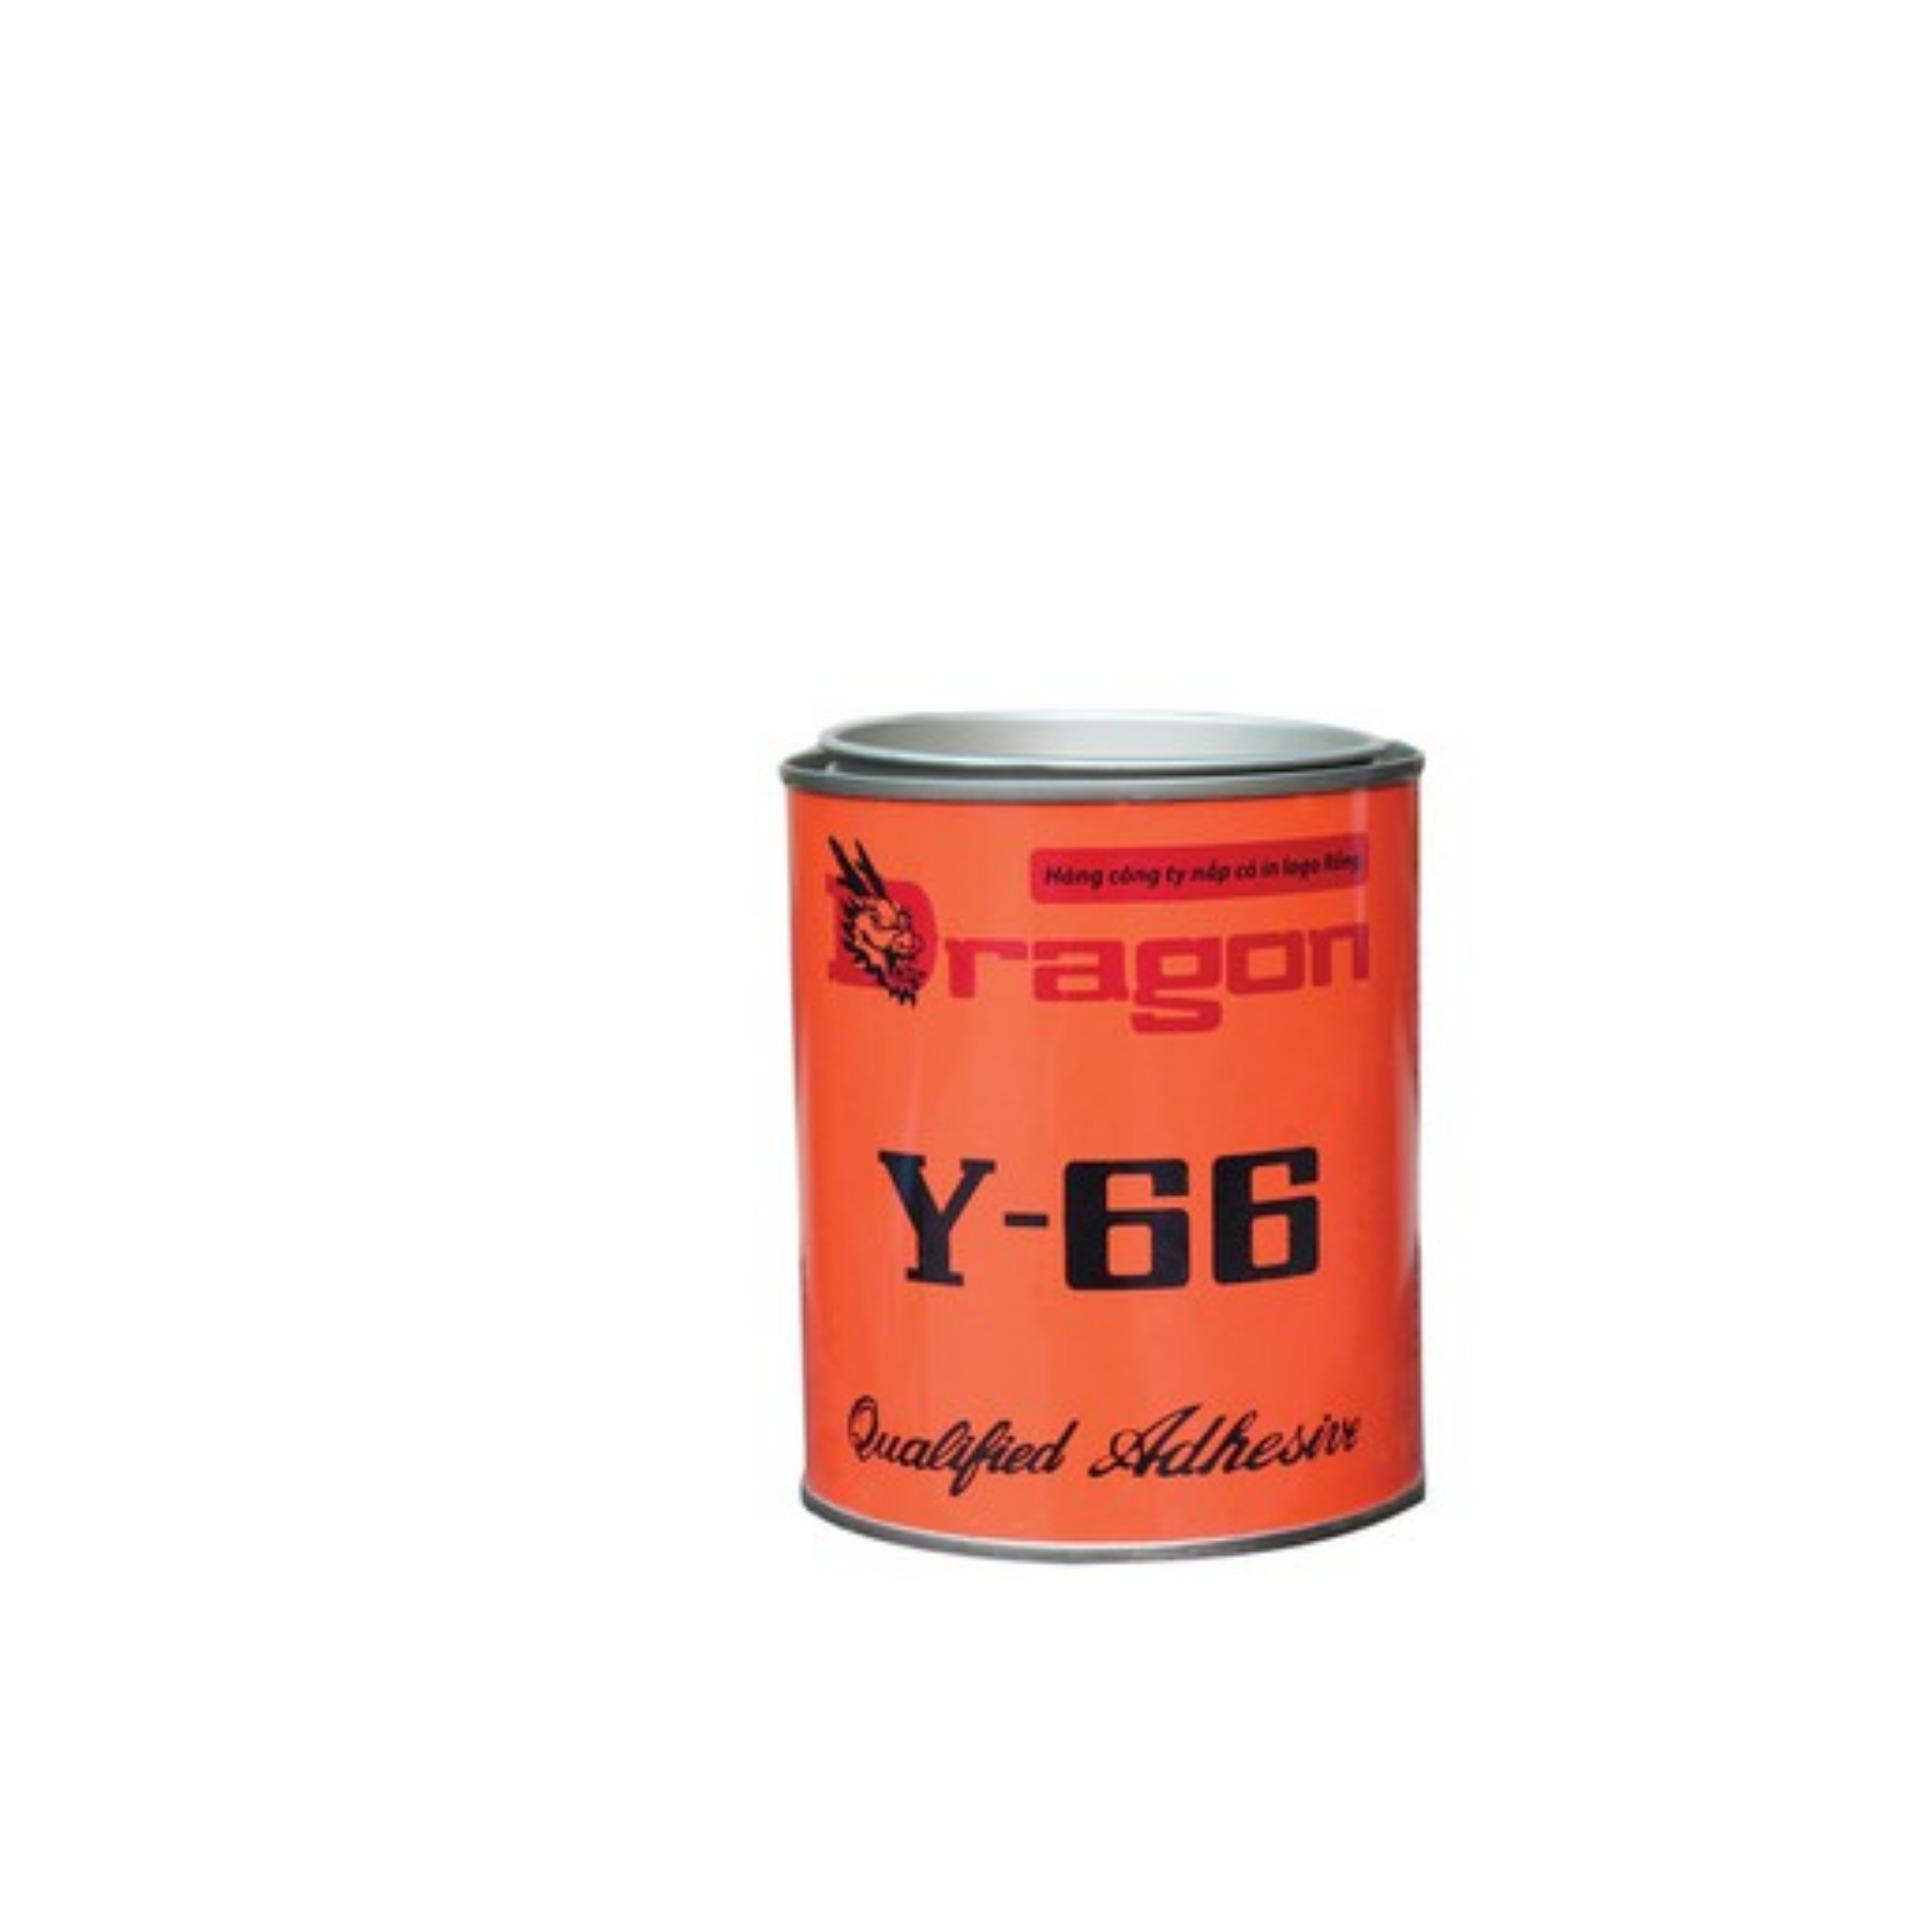 Keo dán đa năng Y-66 200gr